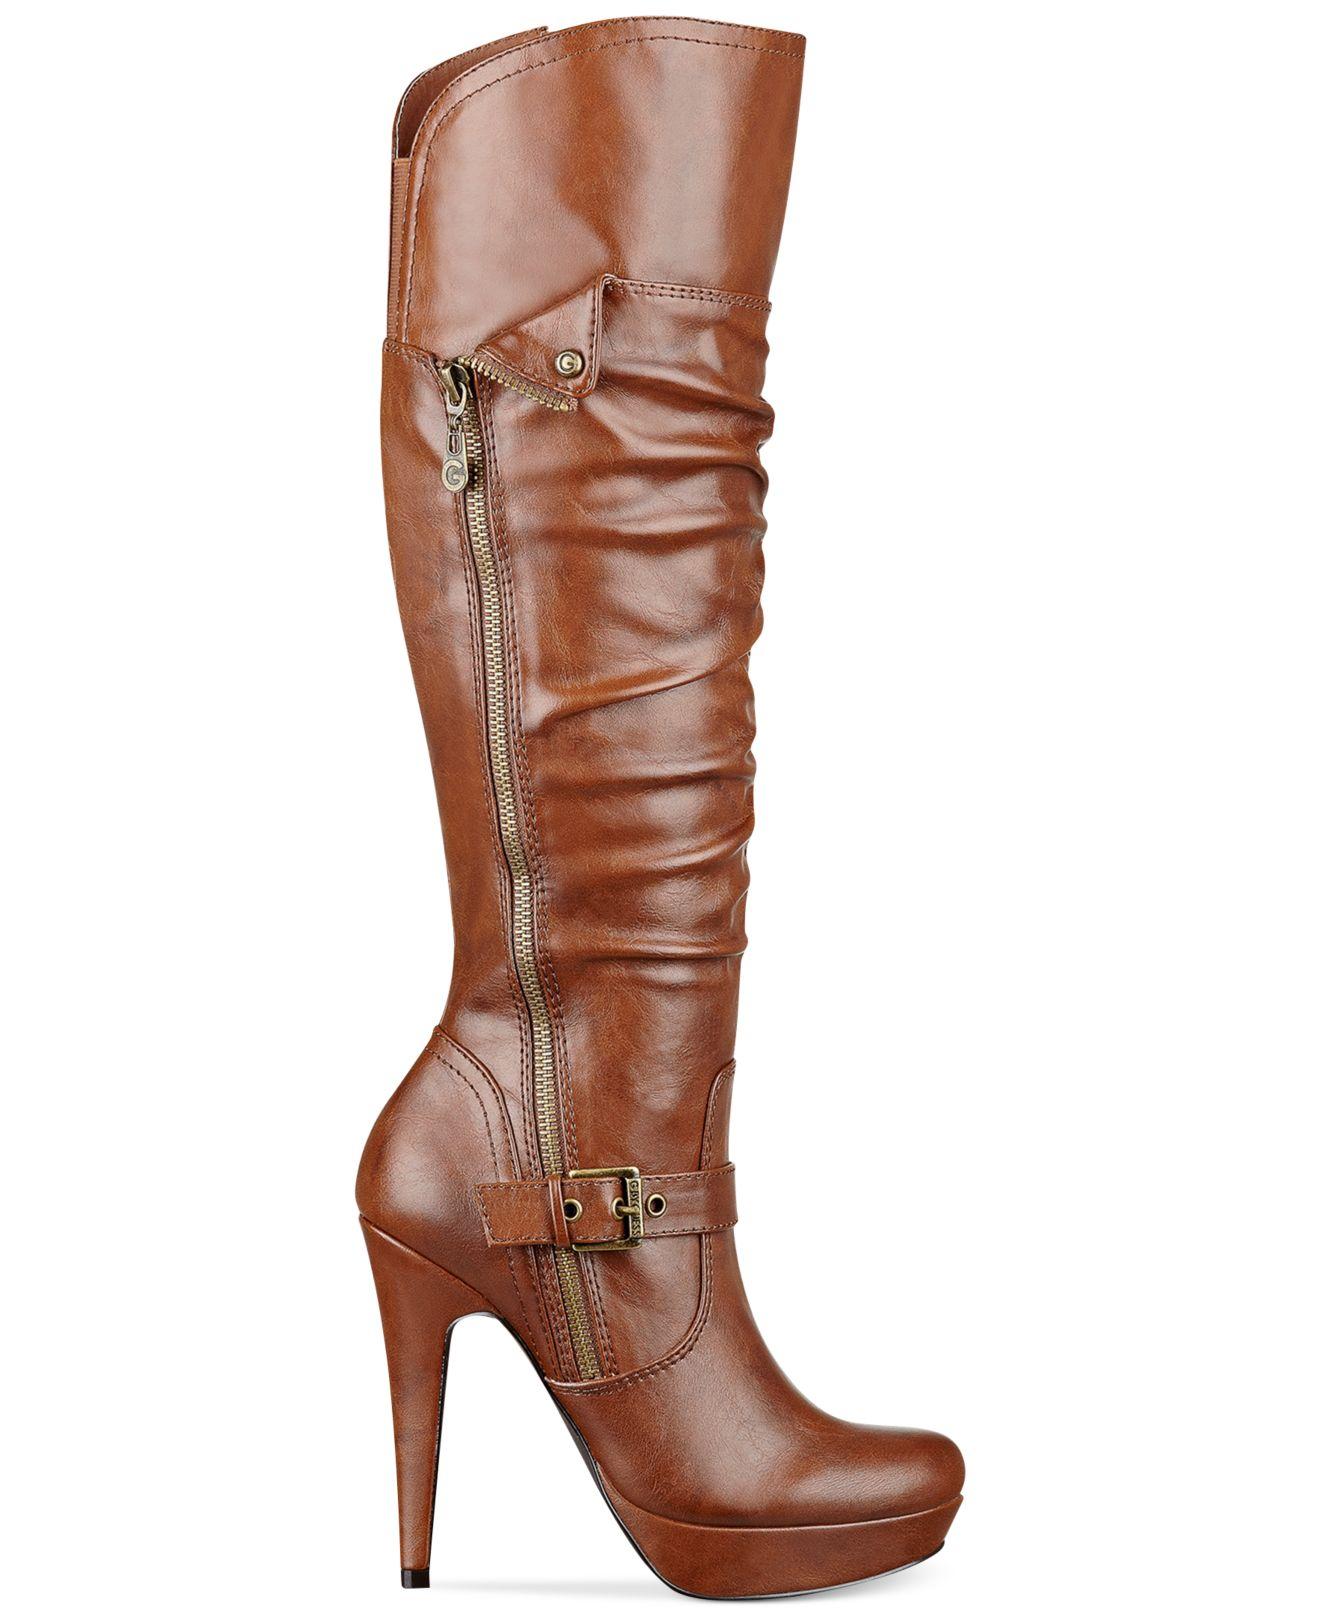 cheap for discount brand new run shoes Platform Dress Boots | Weddings Dresses